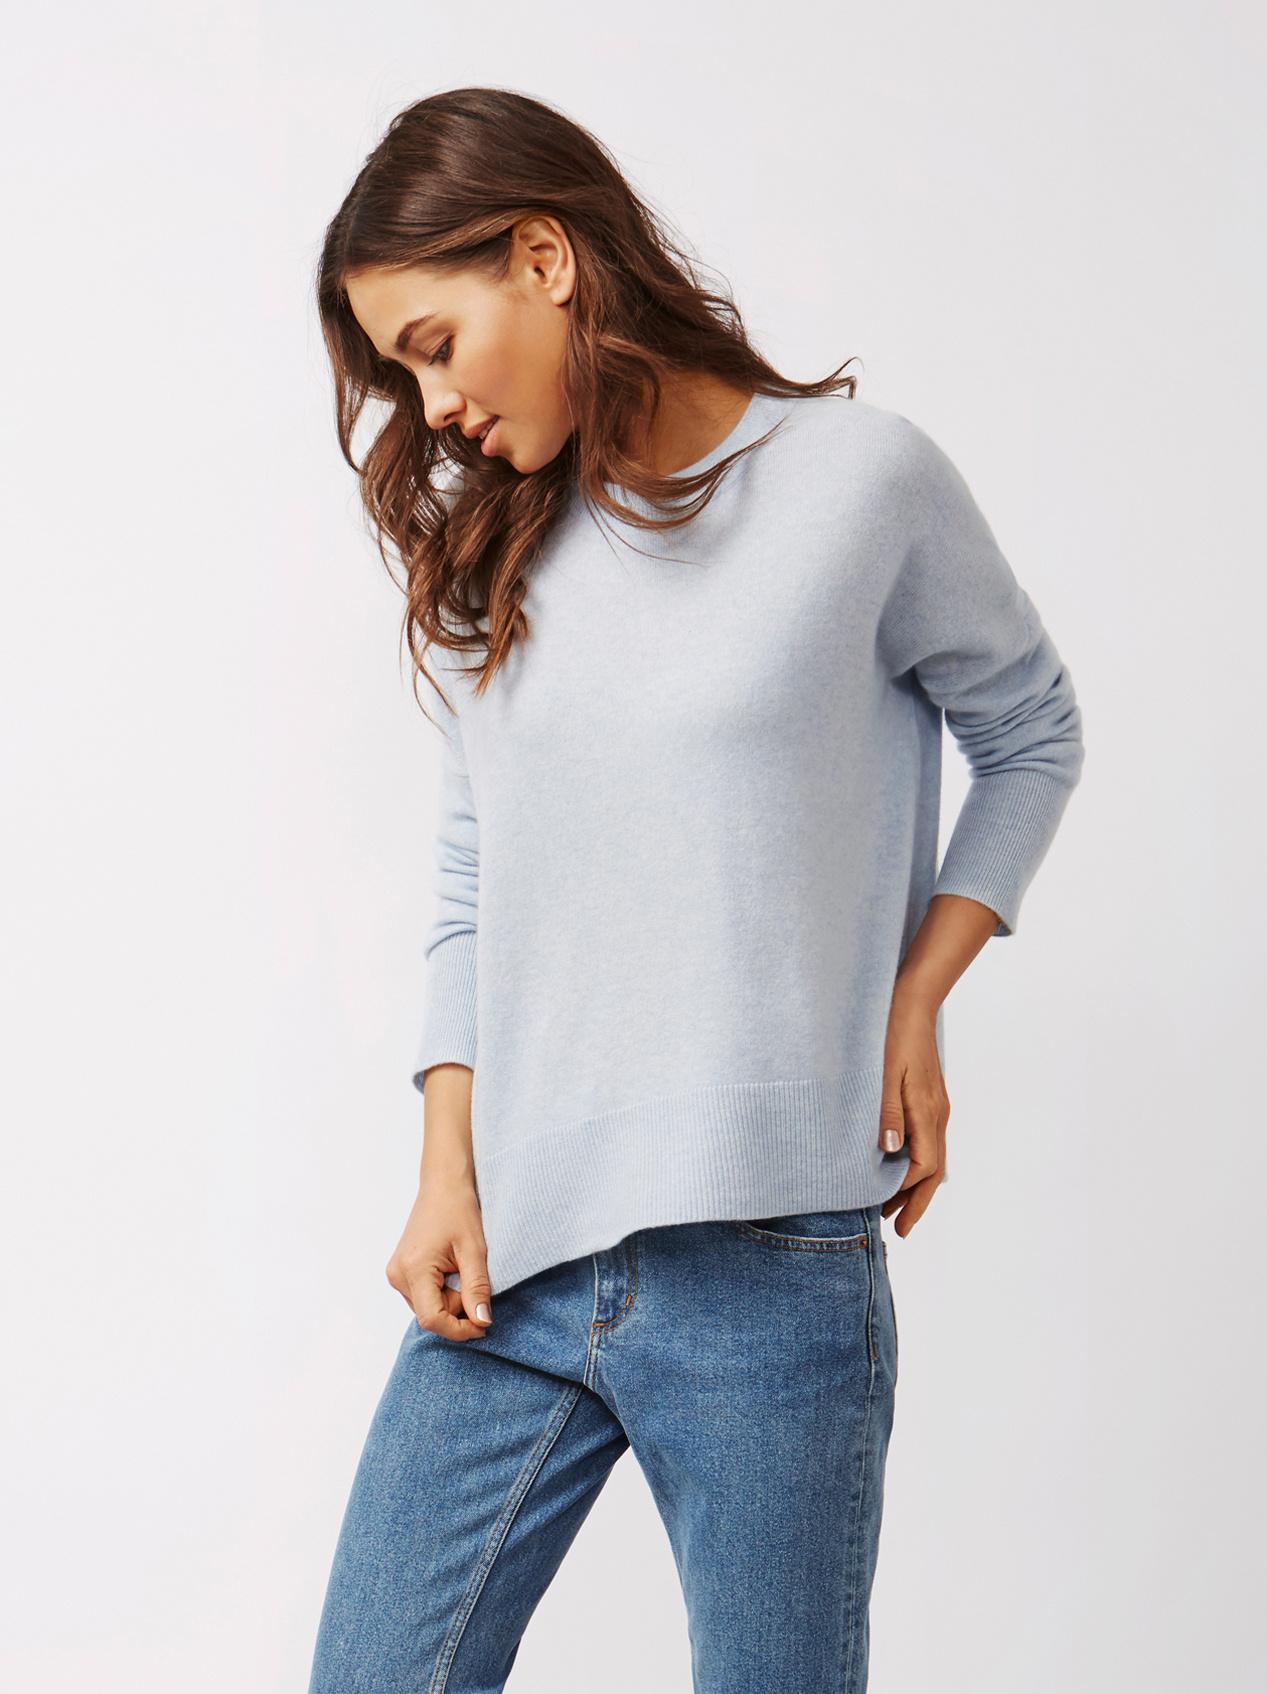 Soft Goat Women's Boyfriend Sweater Light Blue